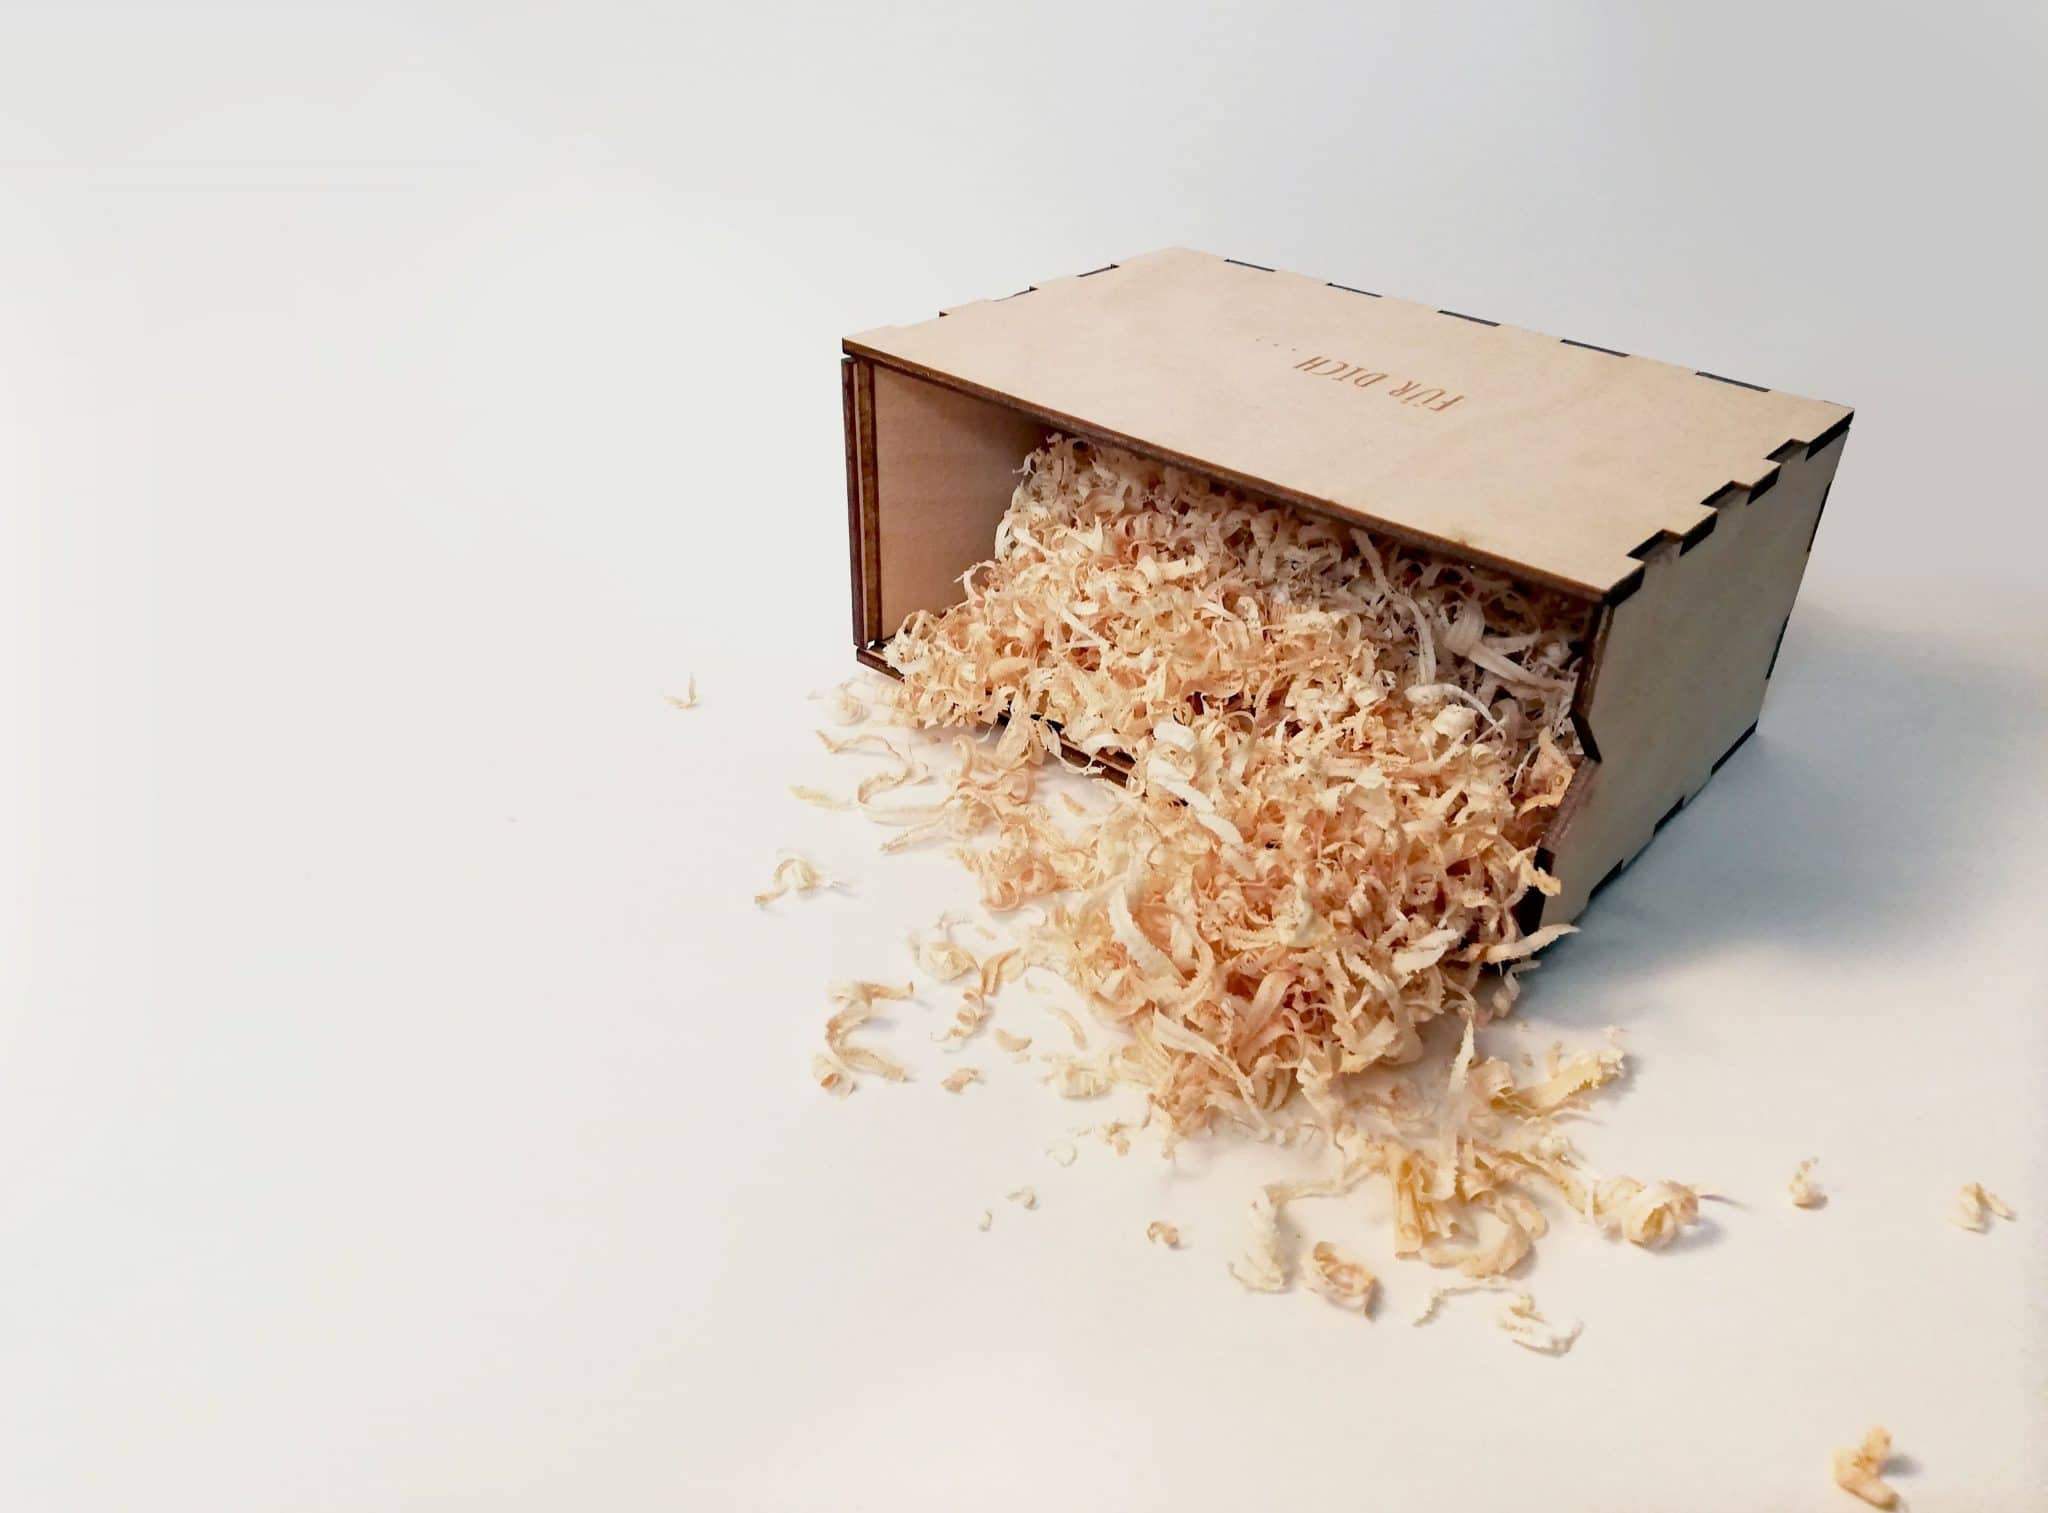 04_bankerl-verpackung2